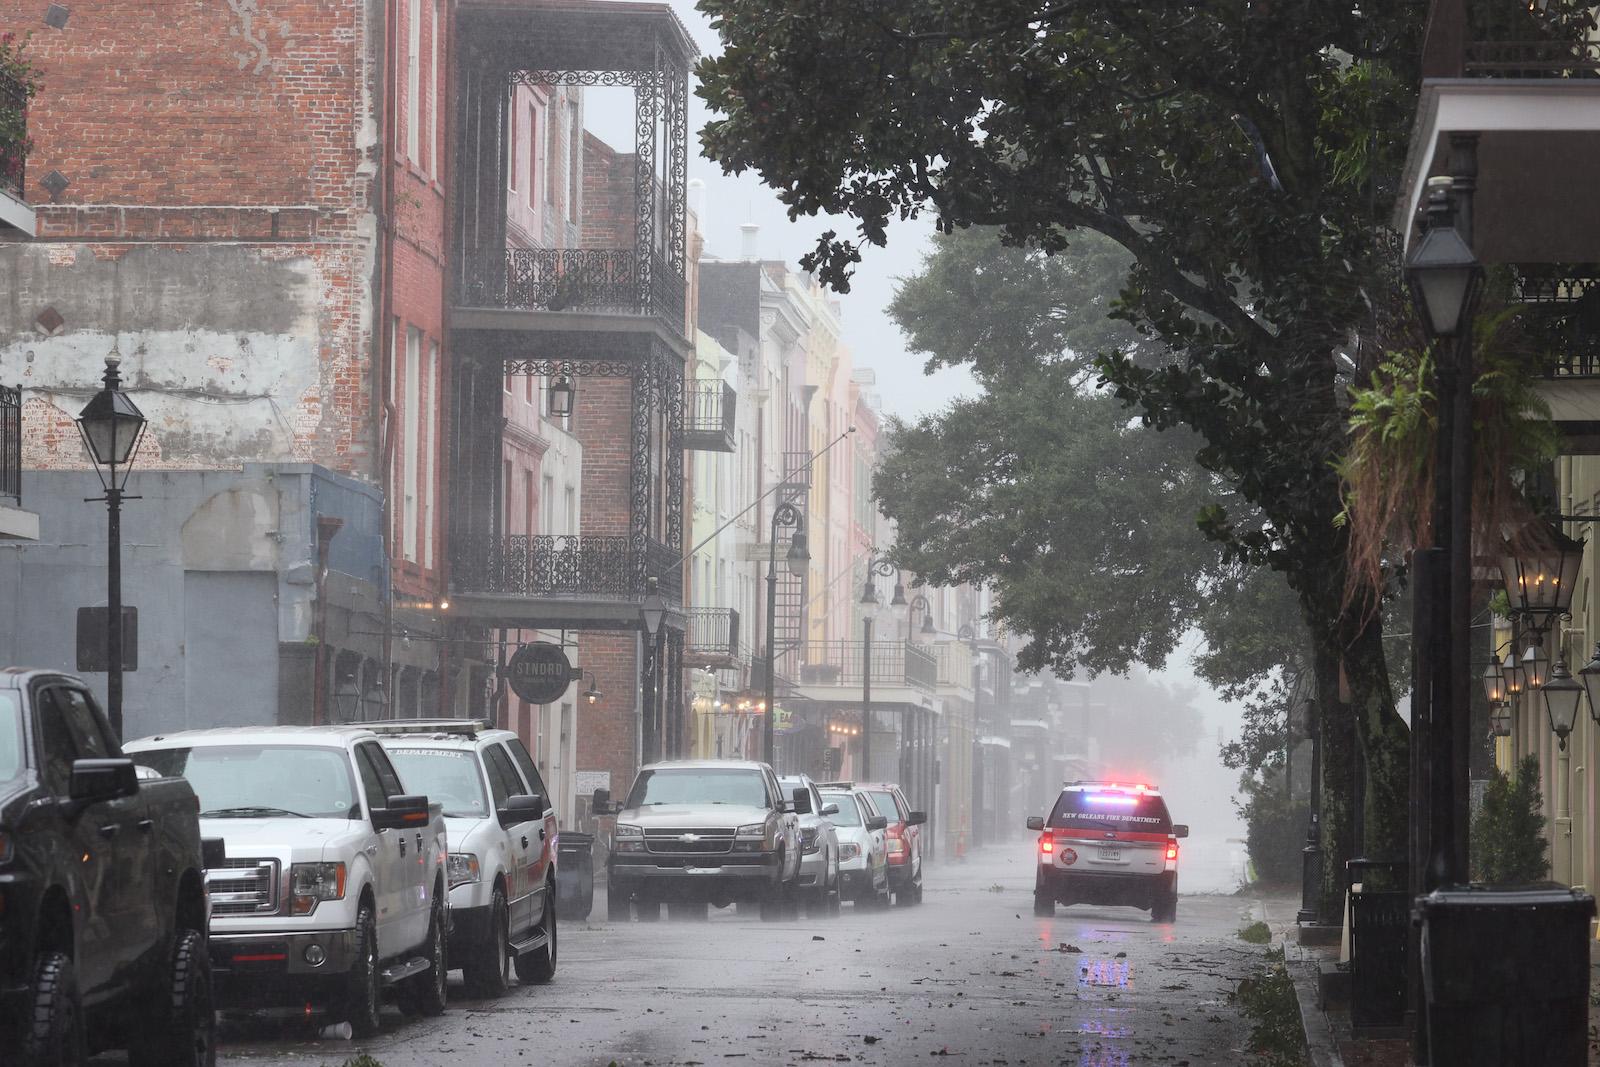 An emergency response vehicle cruises through a street battered by Hurricane Ida